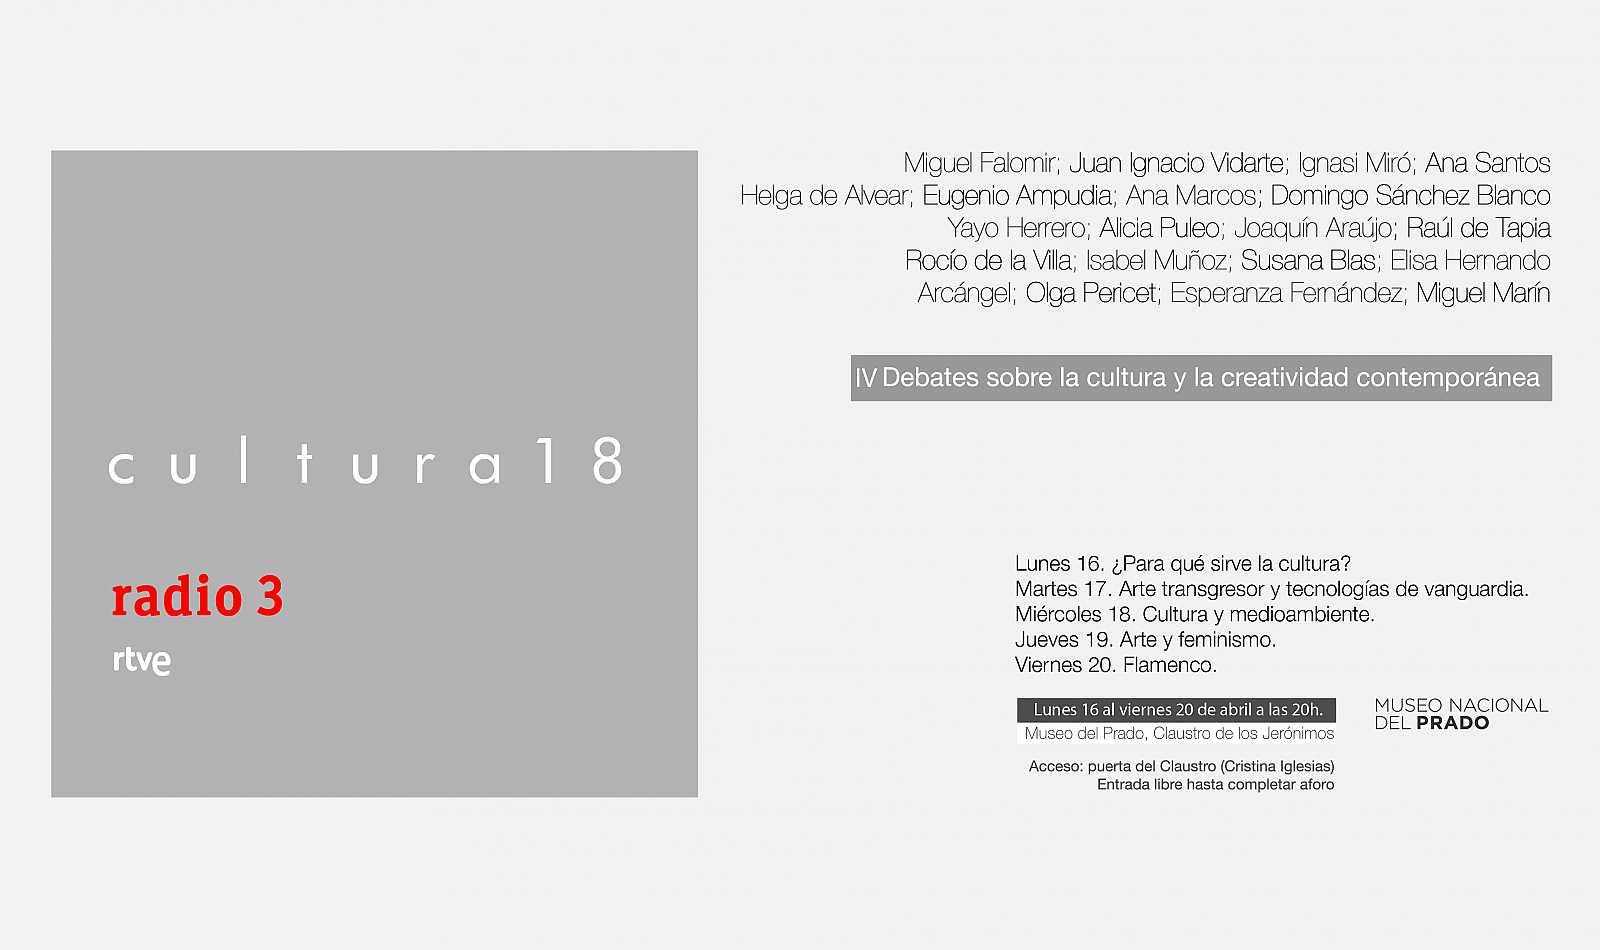 Vuelve #Cultura18. Del 16 al 20 de abril, debatimos sobre la cultura en @museodelprado https://t.co/T4GRLo84Hb https://t.co/xKBzkwOmiE